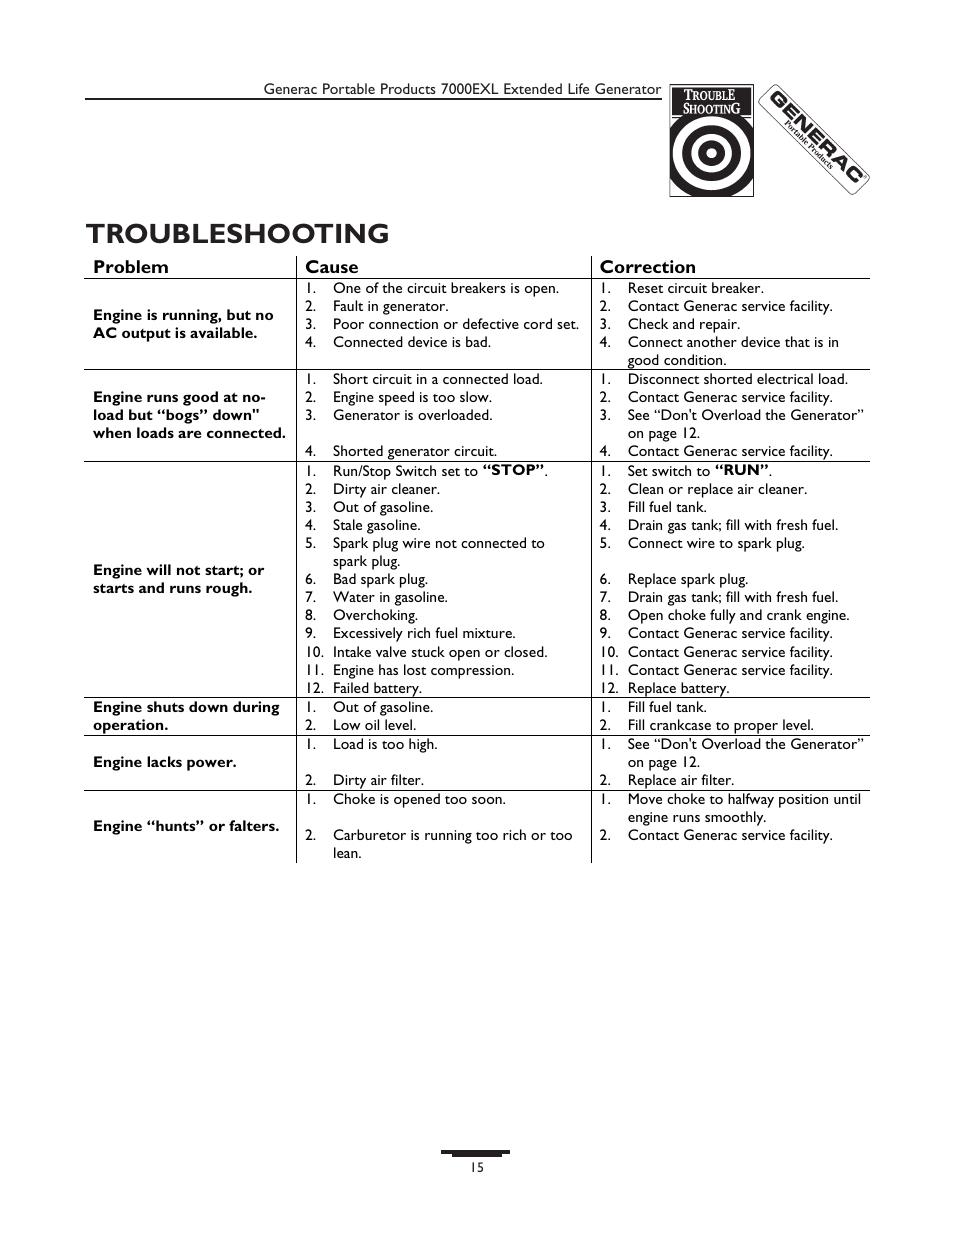 Troubleshooting | Generac 7000exl User Manual | Page 15 / 24